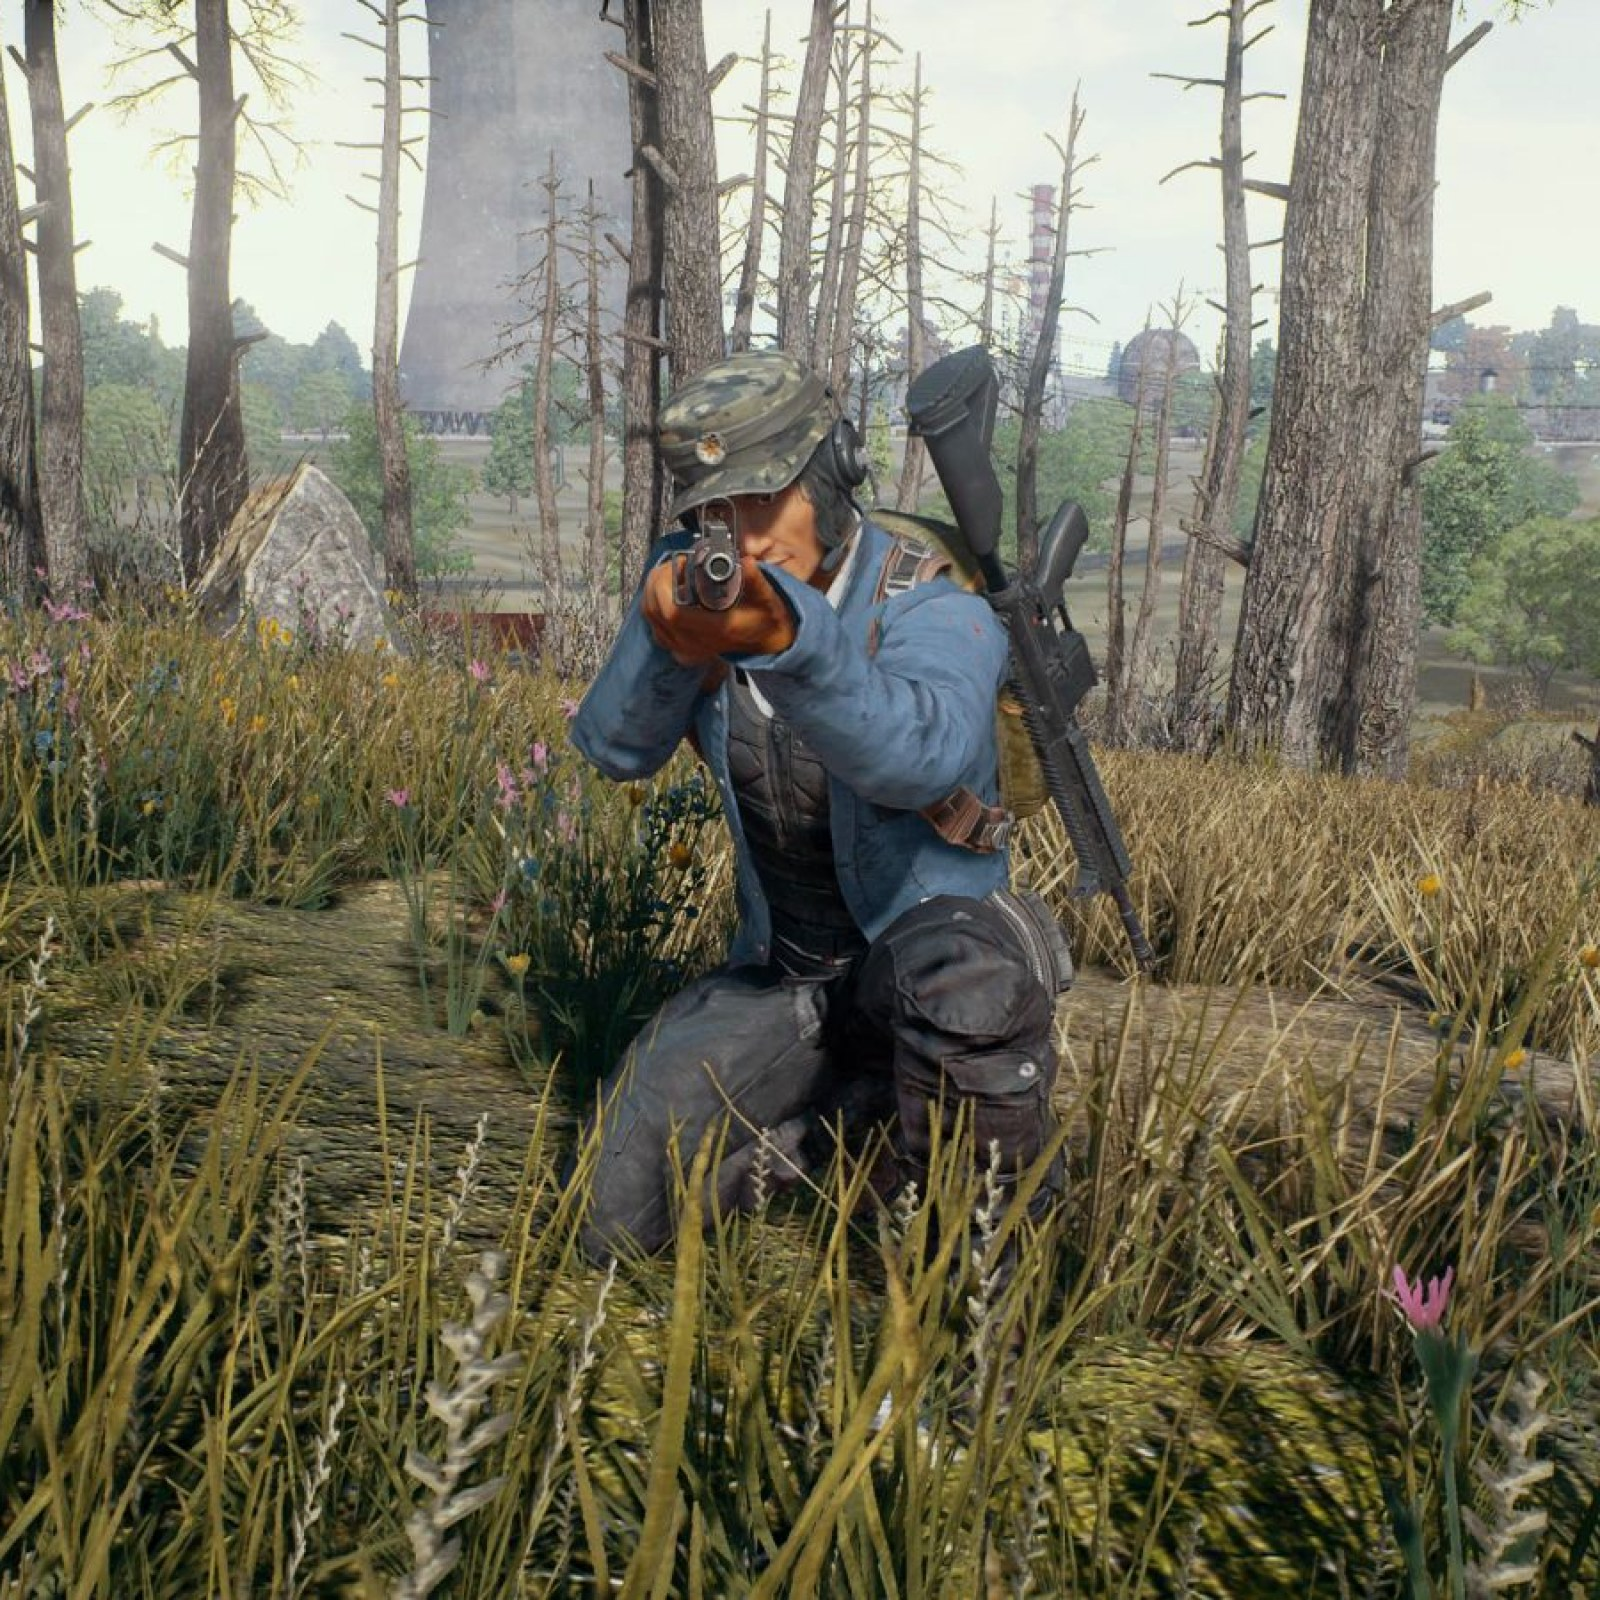 PlayerUnknown's Battlegrounds - Early Access Trailer